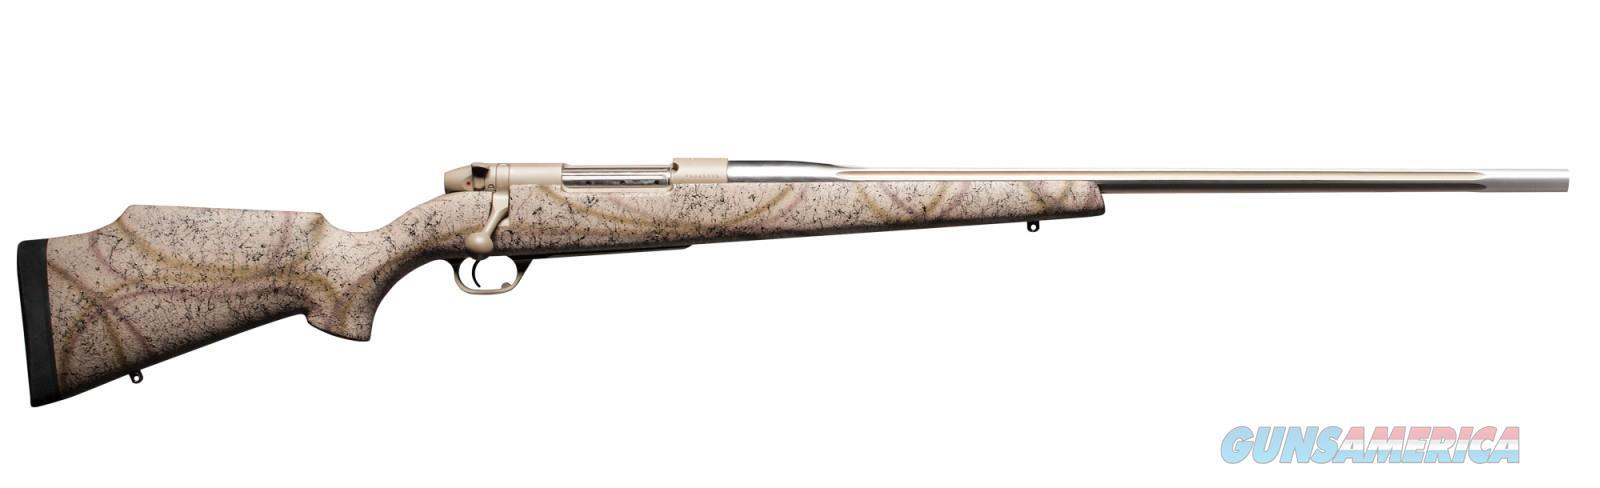 "Weatherby Mark V Terramark 7mm Wby Mag 26"" FDE/Desert Camo MATM7MMWR6O  Guns > Rifles > Weatherby Rifles > Sporting"